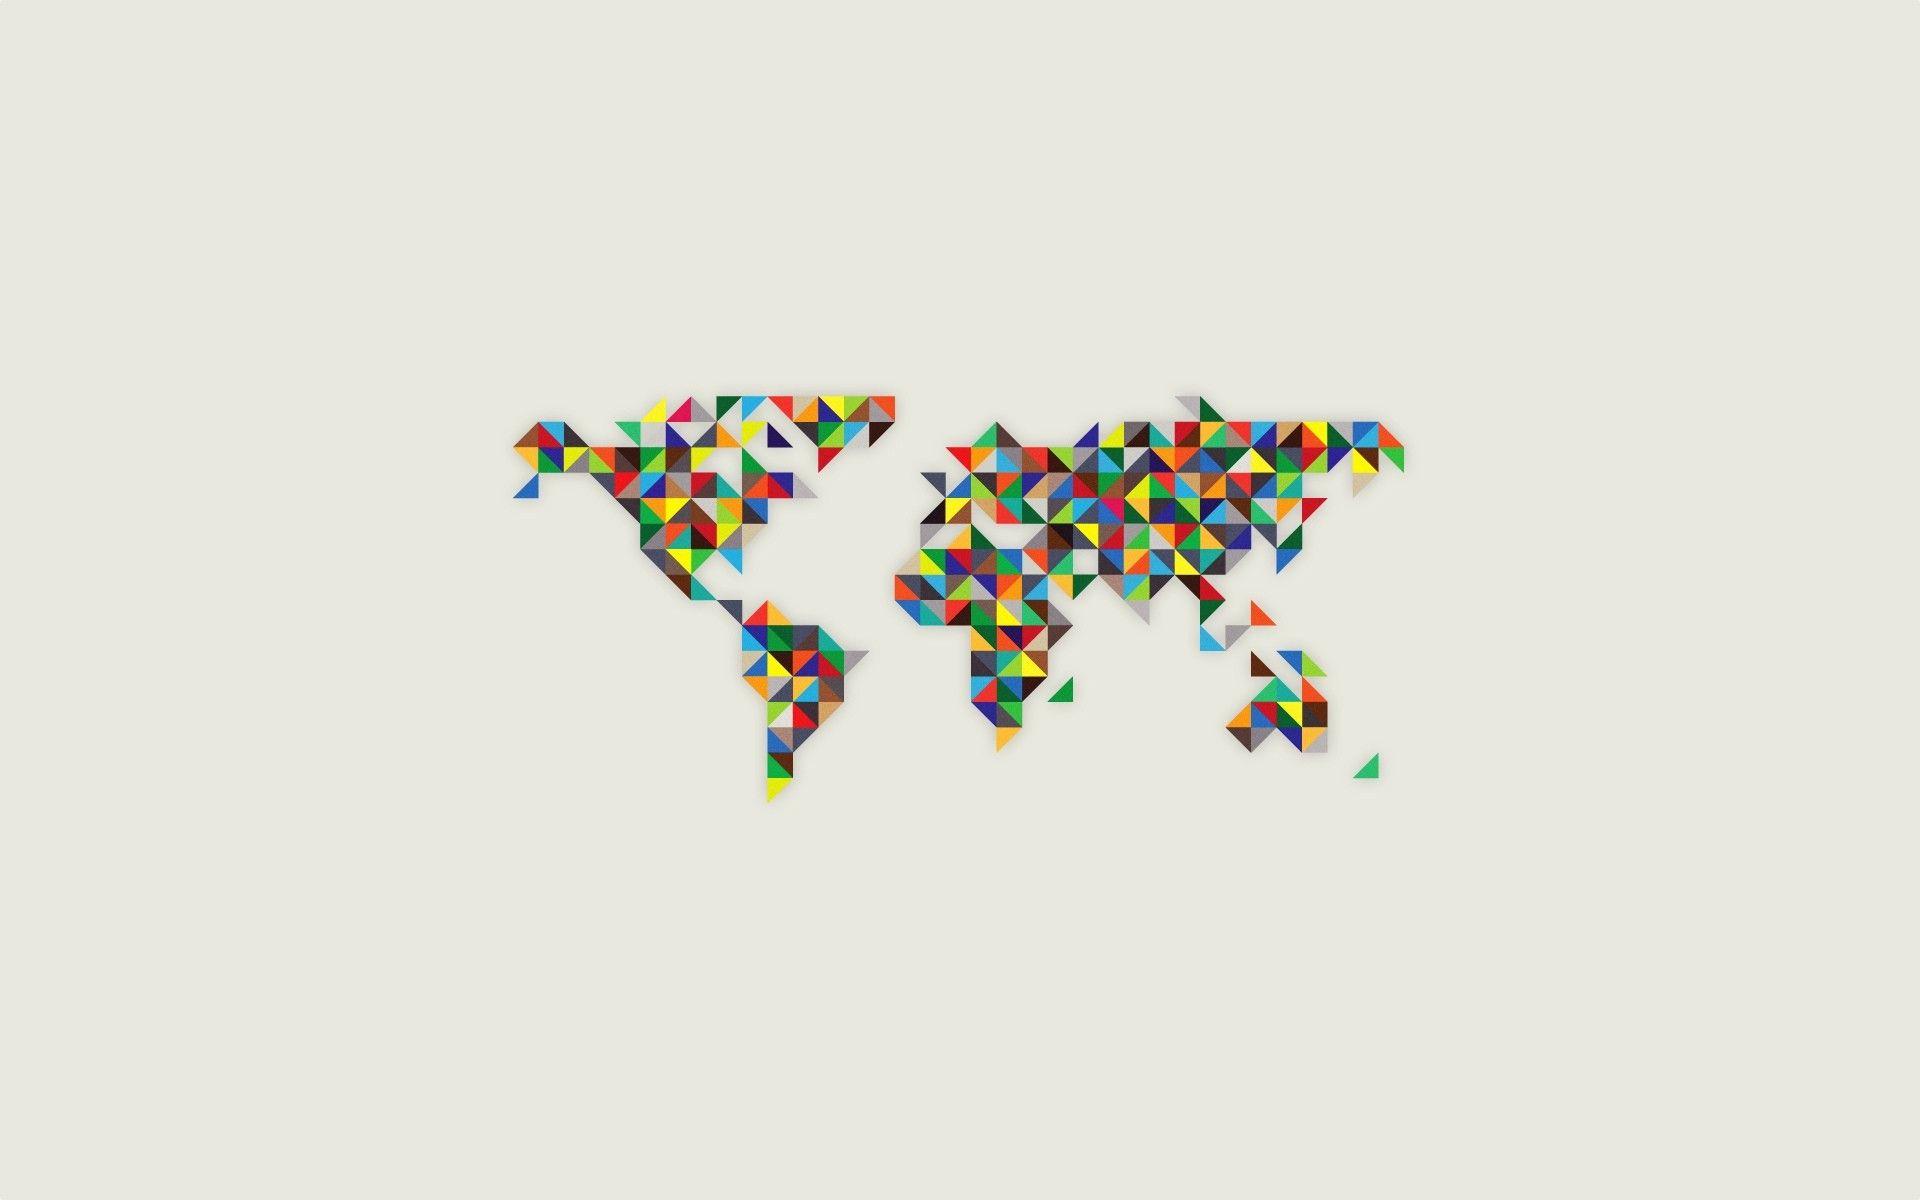 Minimalistic world earth maps world map colors 1920x1200 wallpaper minimalistic world earth maps world map colors 1920x1200 wallpaper gumiabroncs Choice Image